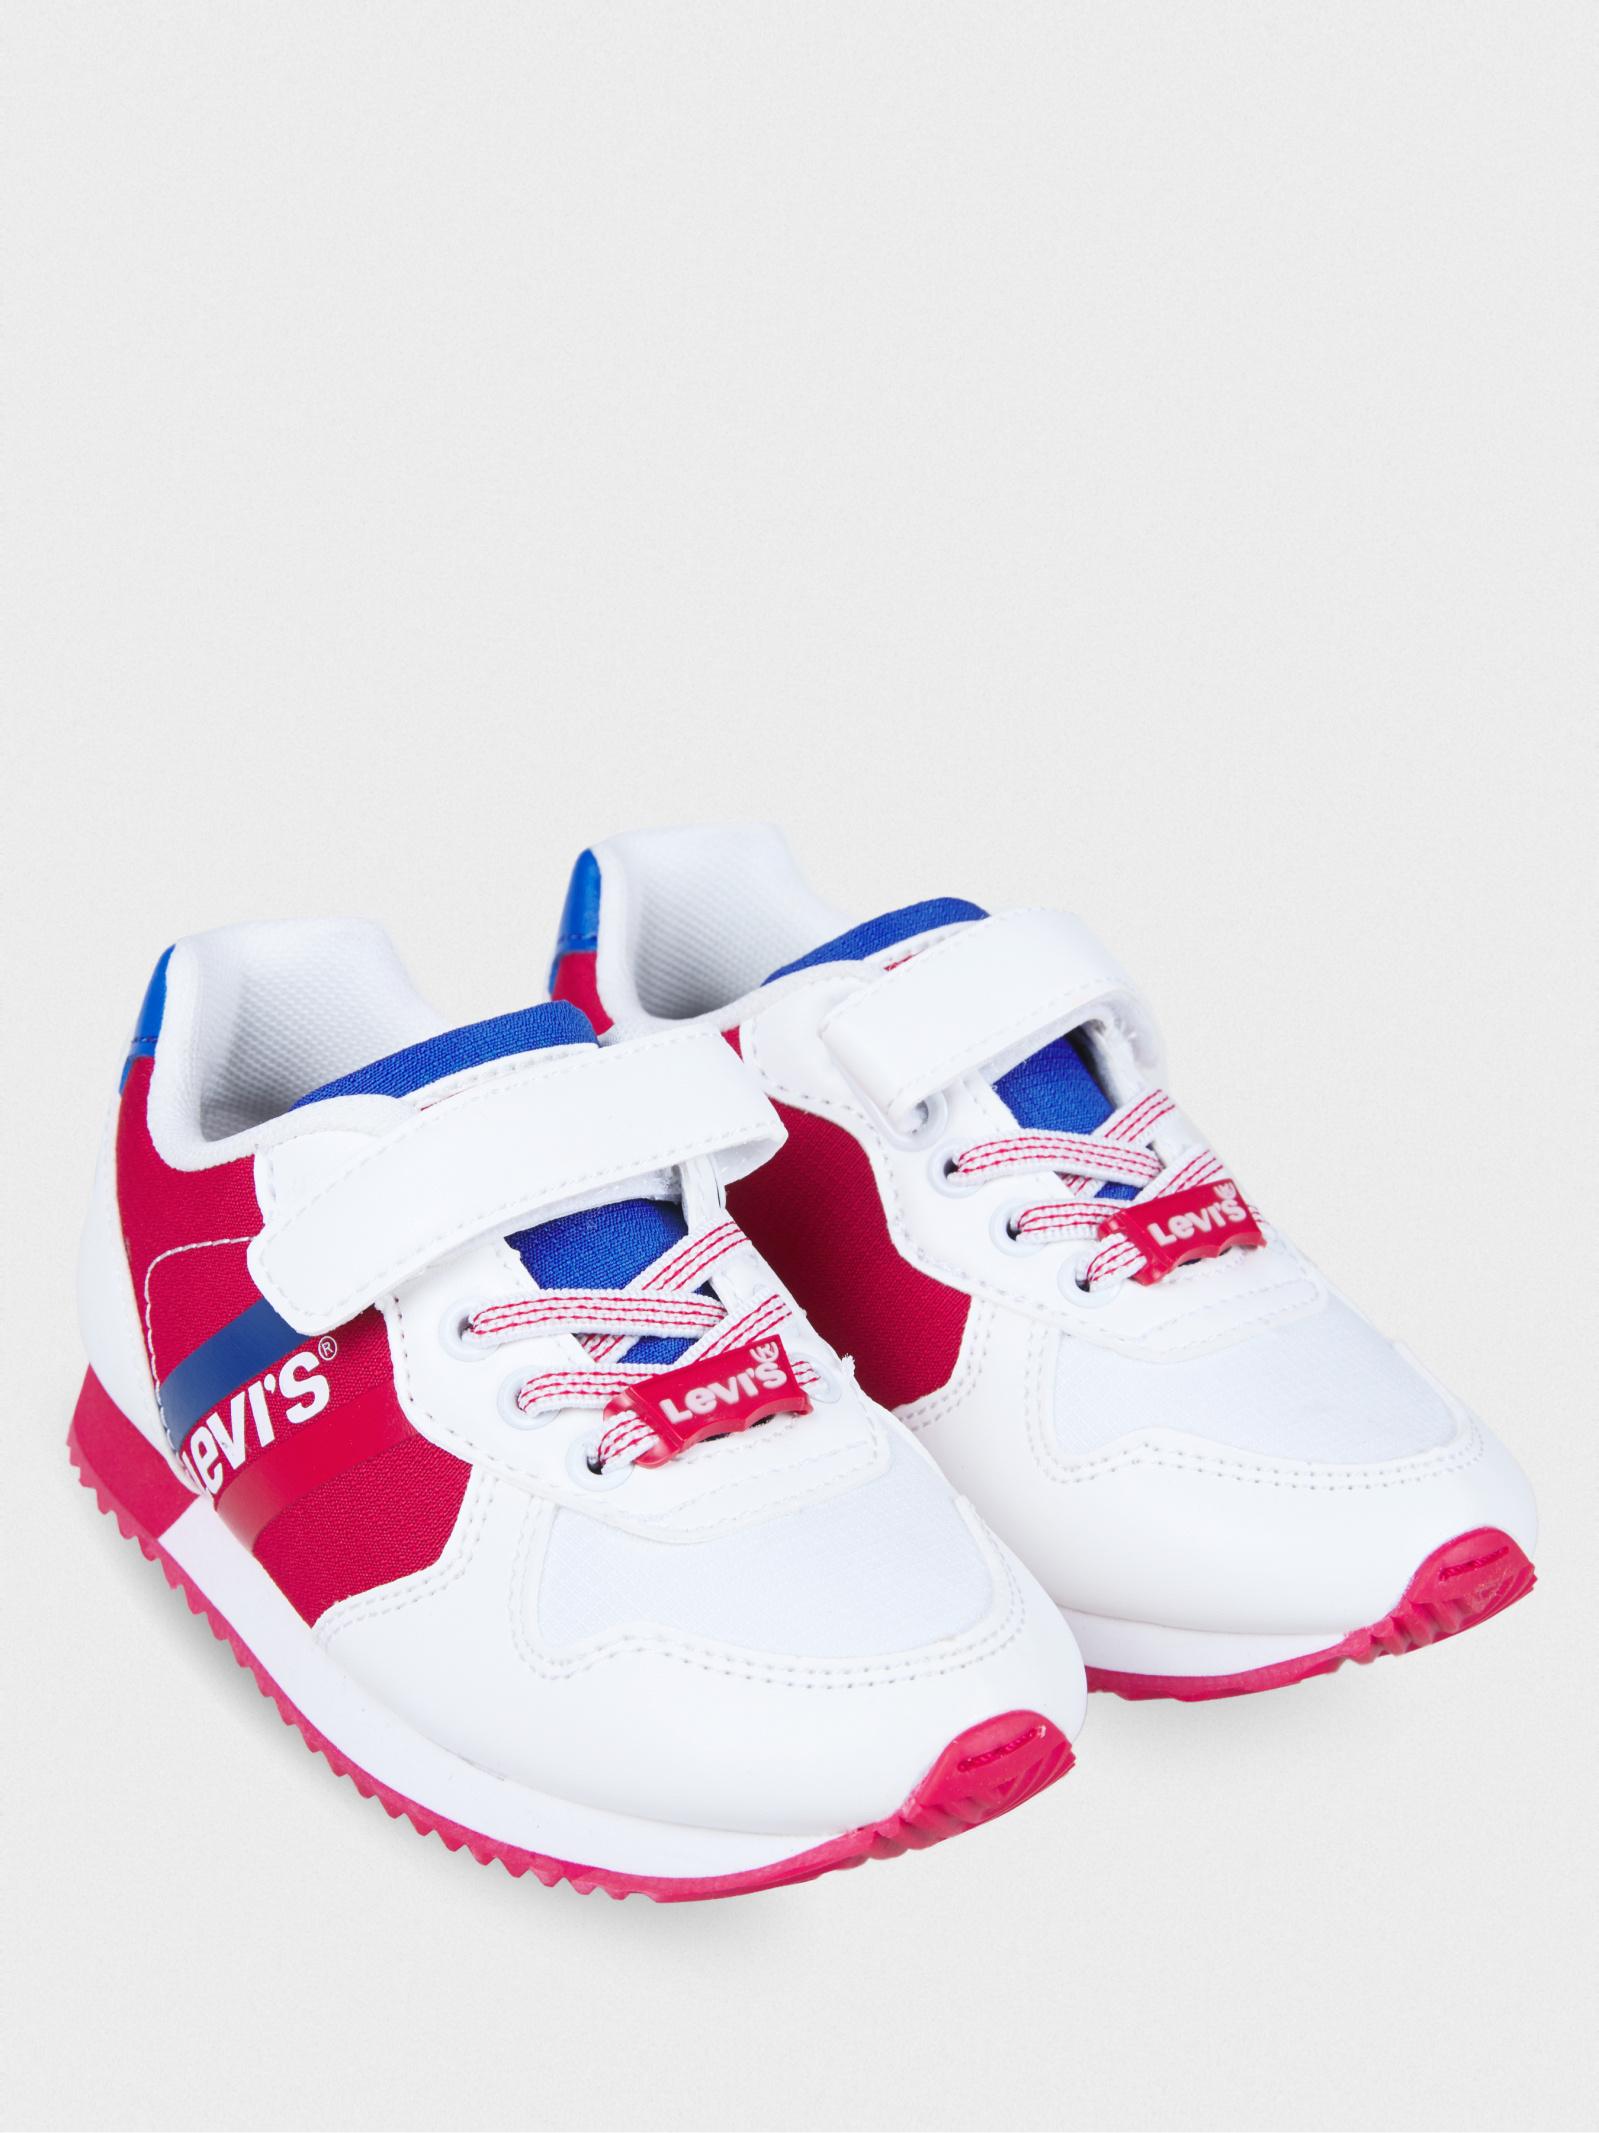 Кросівки  для дітей Levi's VSPR0022T WHITERED0079 VSPR0022T WHITERED0079 ціна взуття, 2017